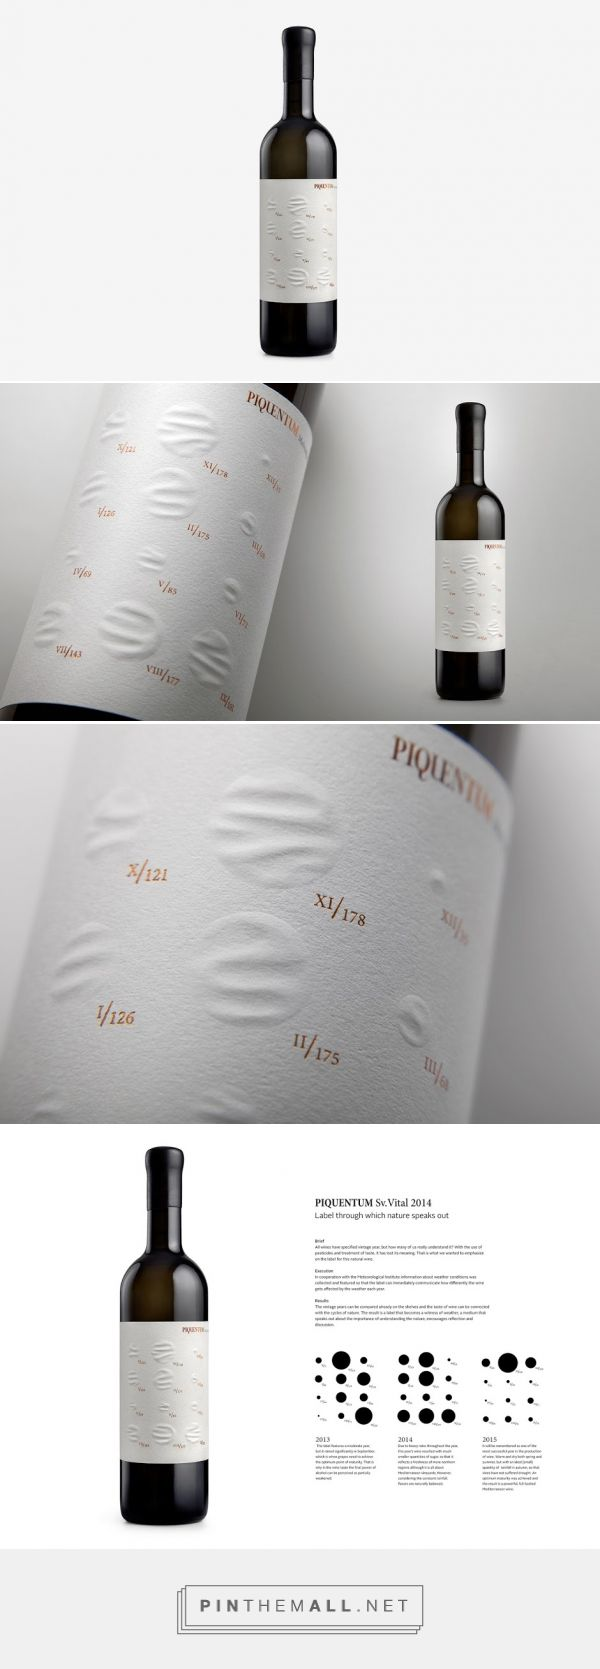 Piquentum St. Vital wine label shows rainfall amount - design by Studio Sonda (Croatia) - http://www.packagingoftheworld.com/2016/04/piquentum-st-vital.html